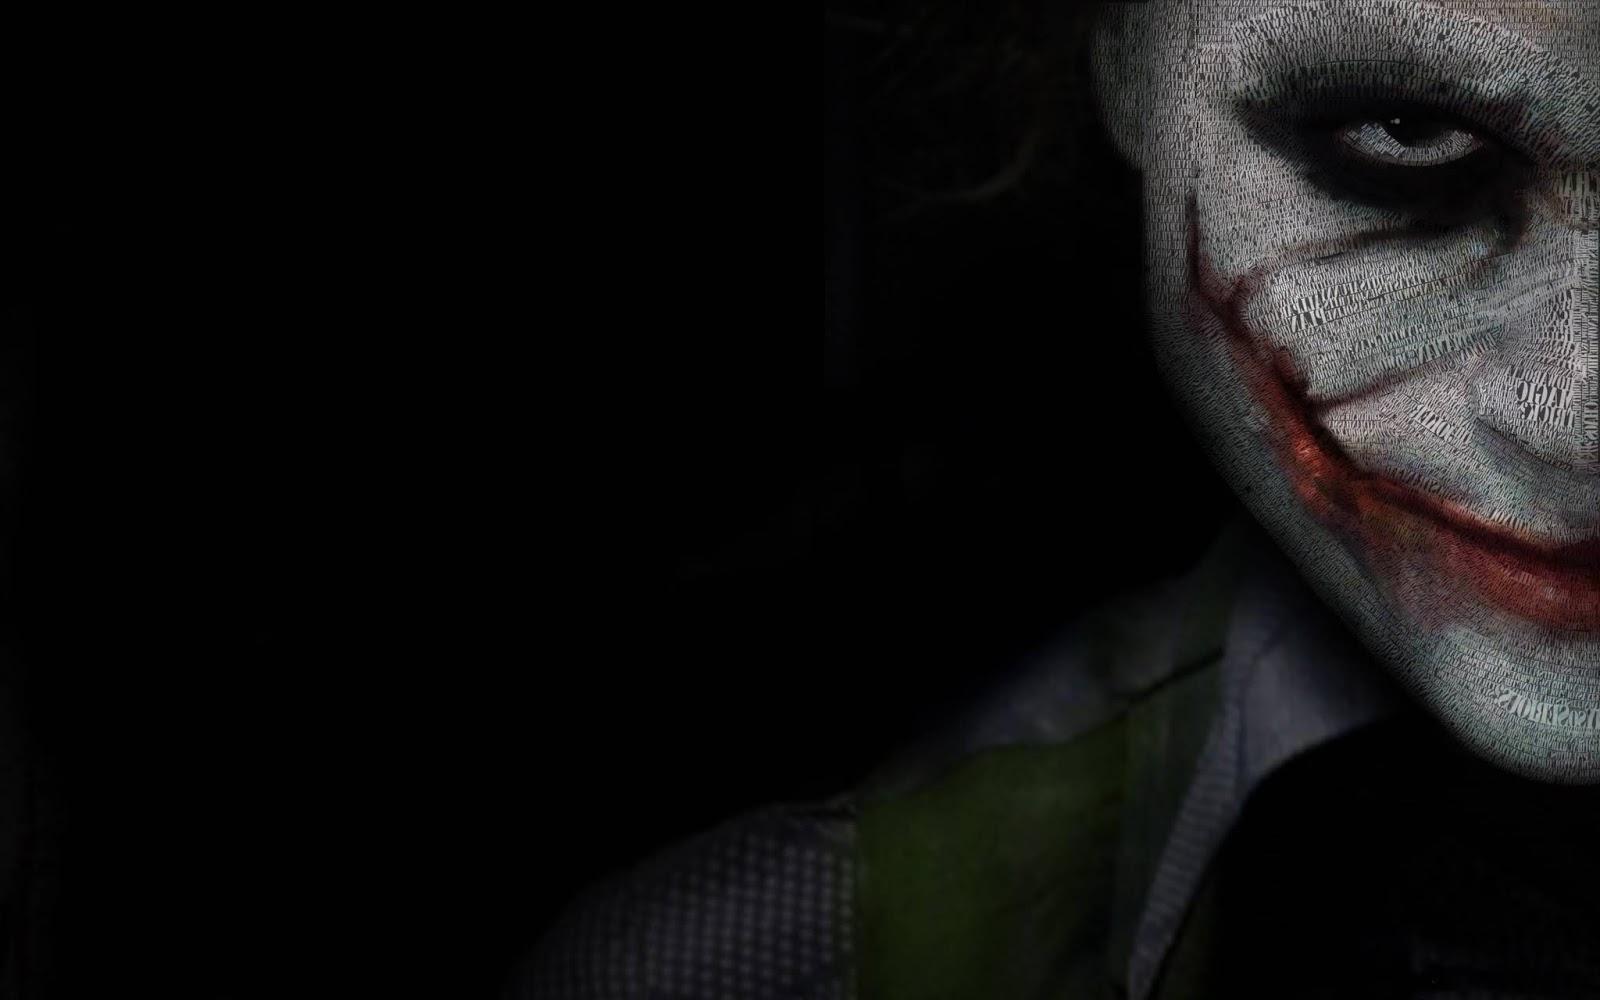 Joker-suicide-squad-wallpaper-4k